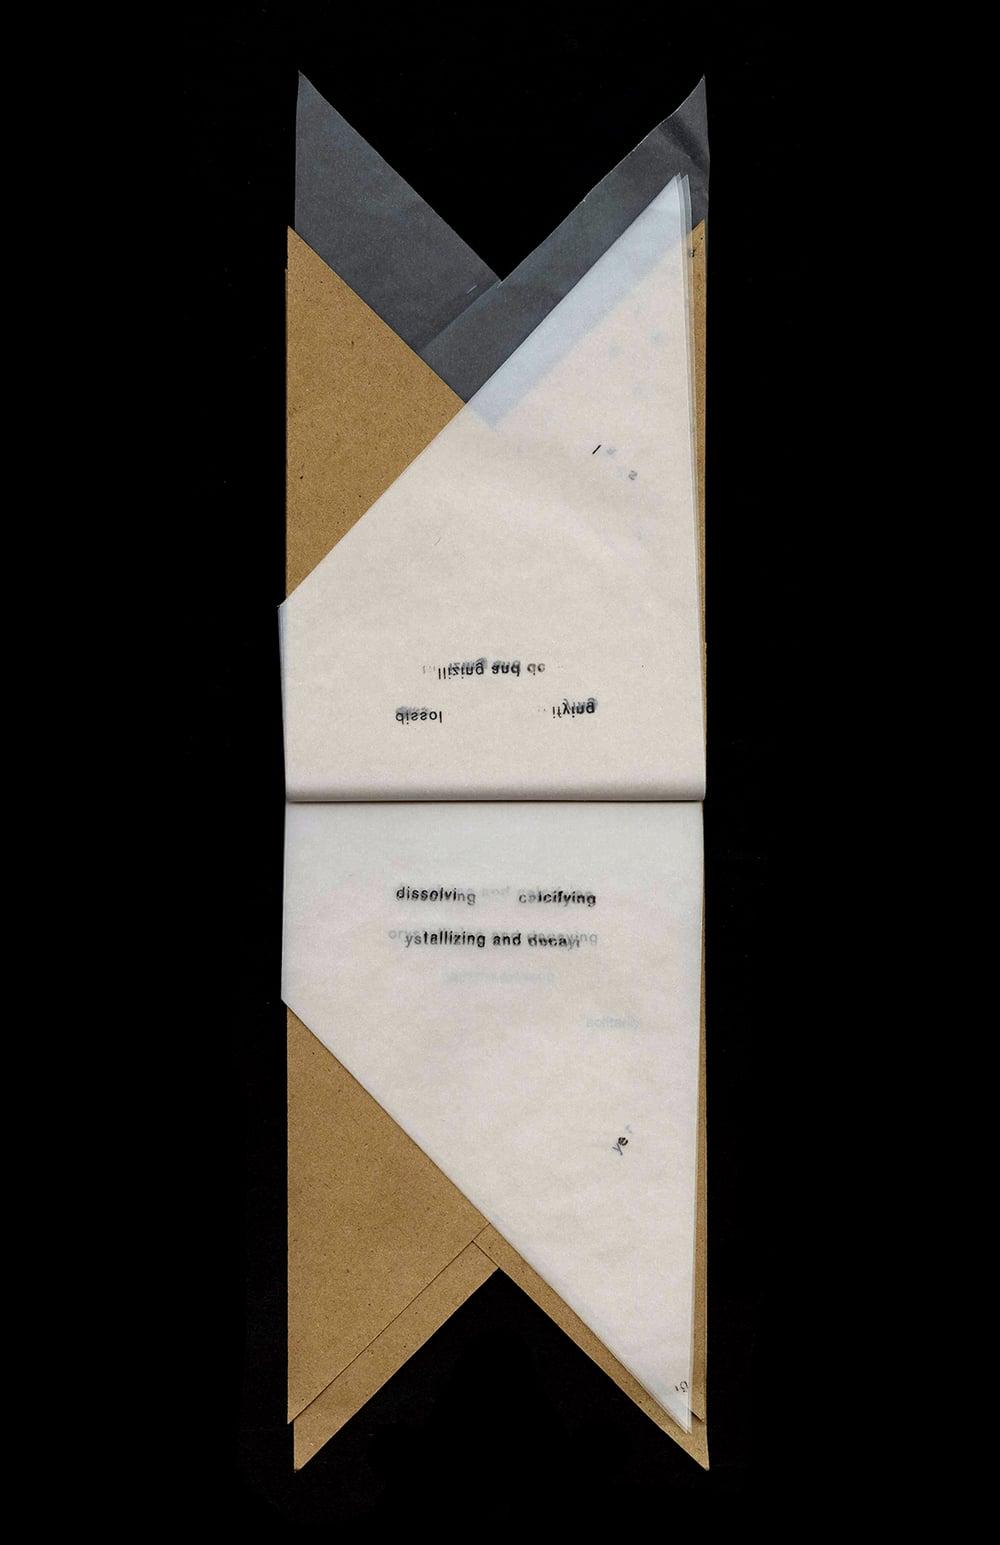 fallmid_0011_Levels 1 copy 7.jpg